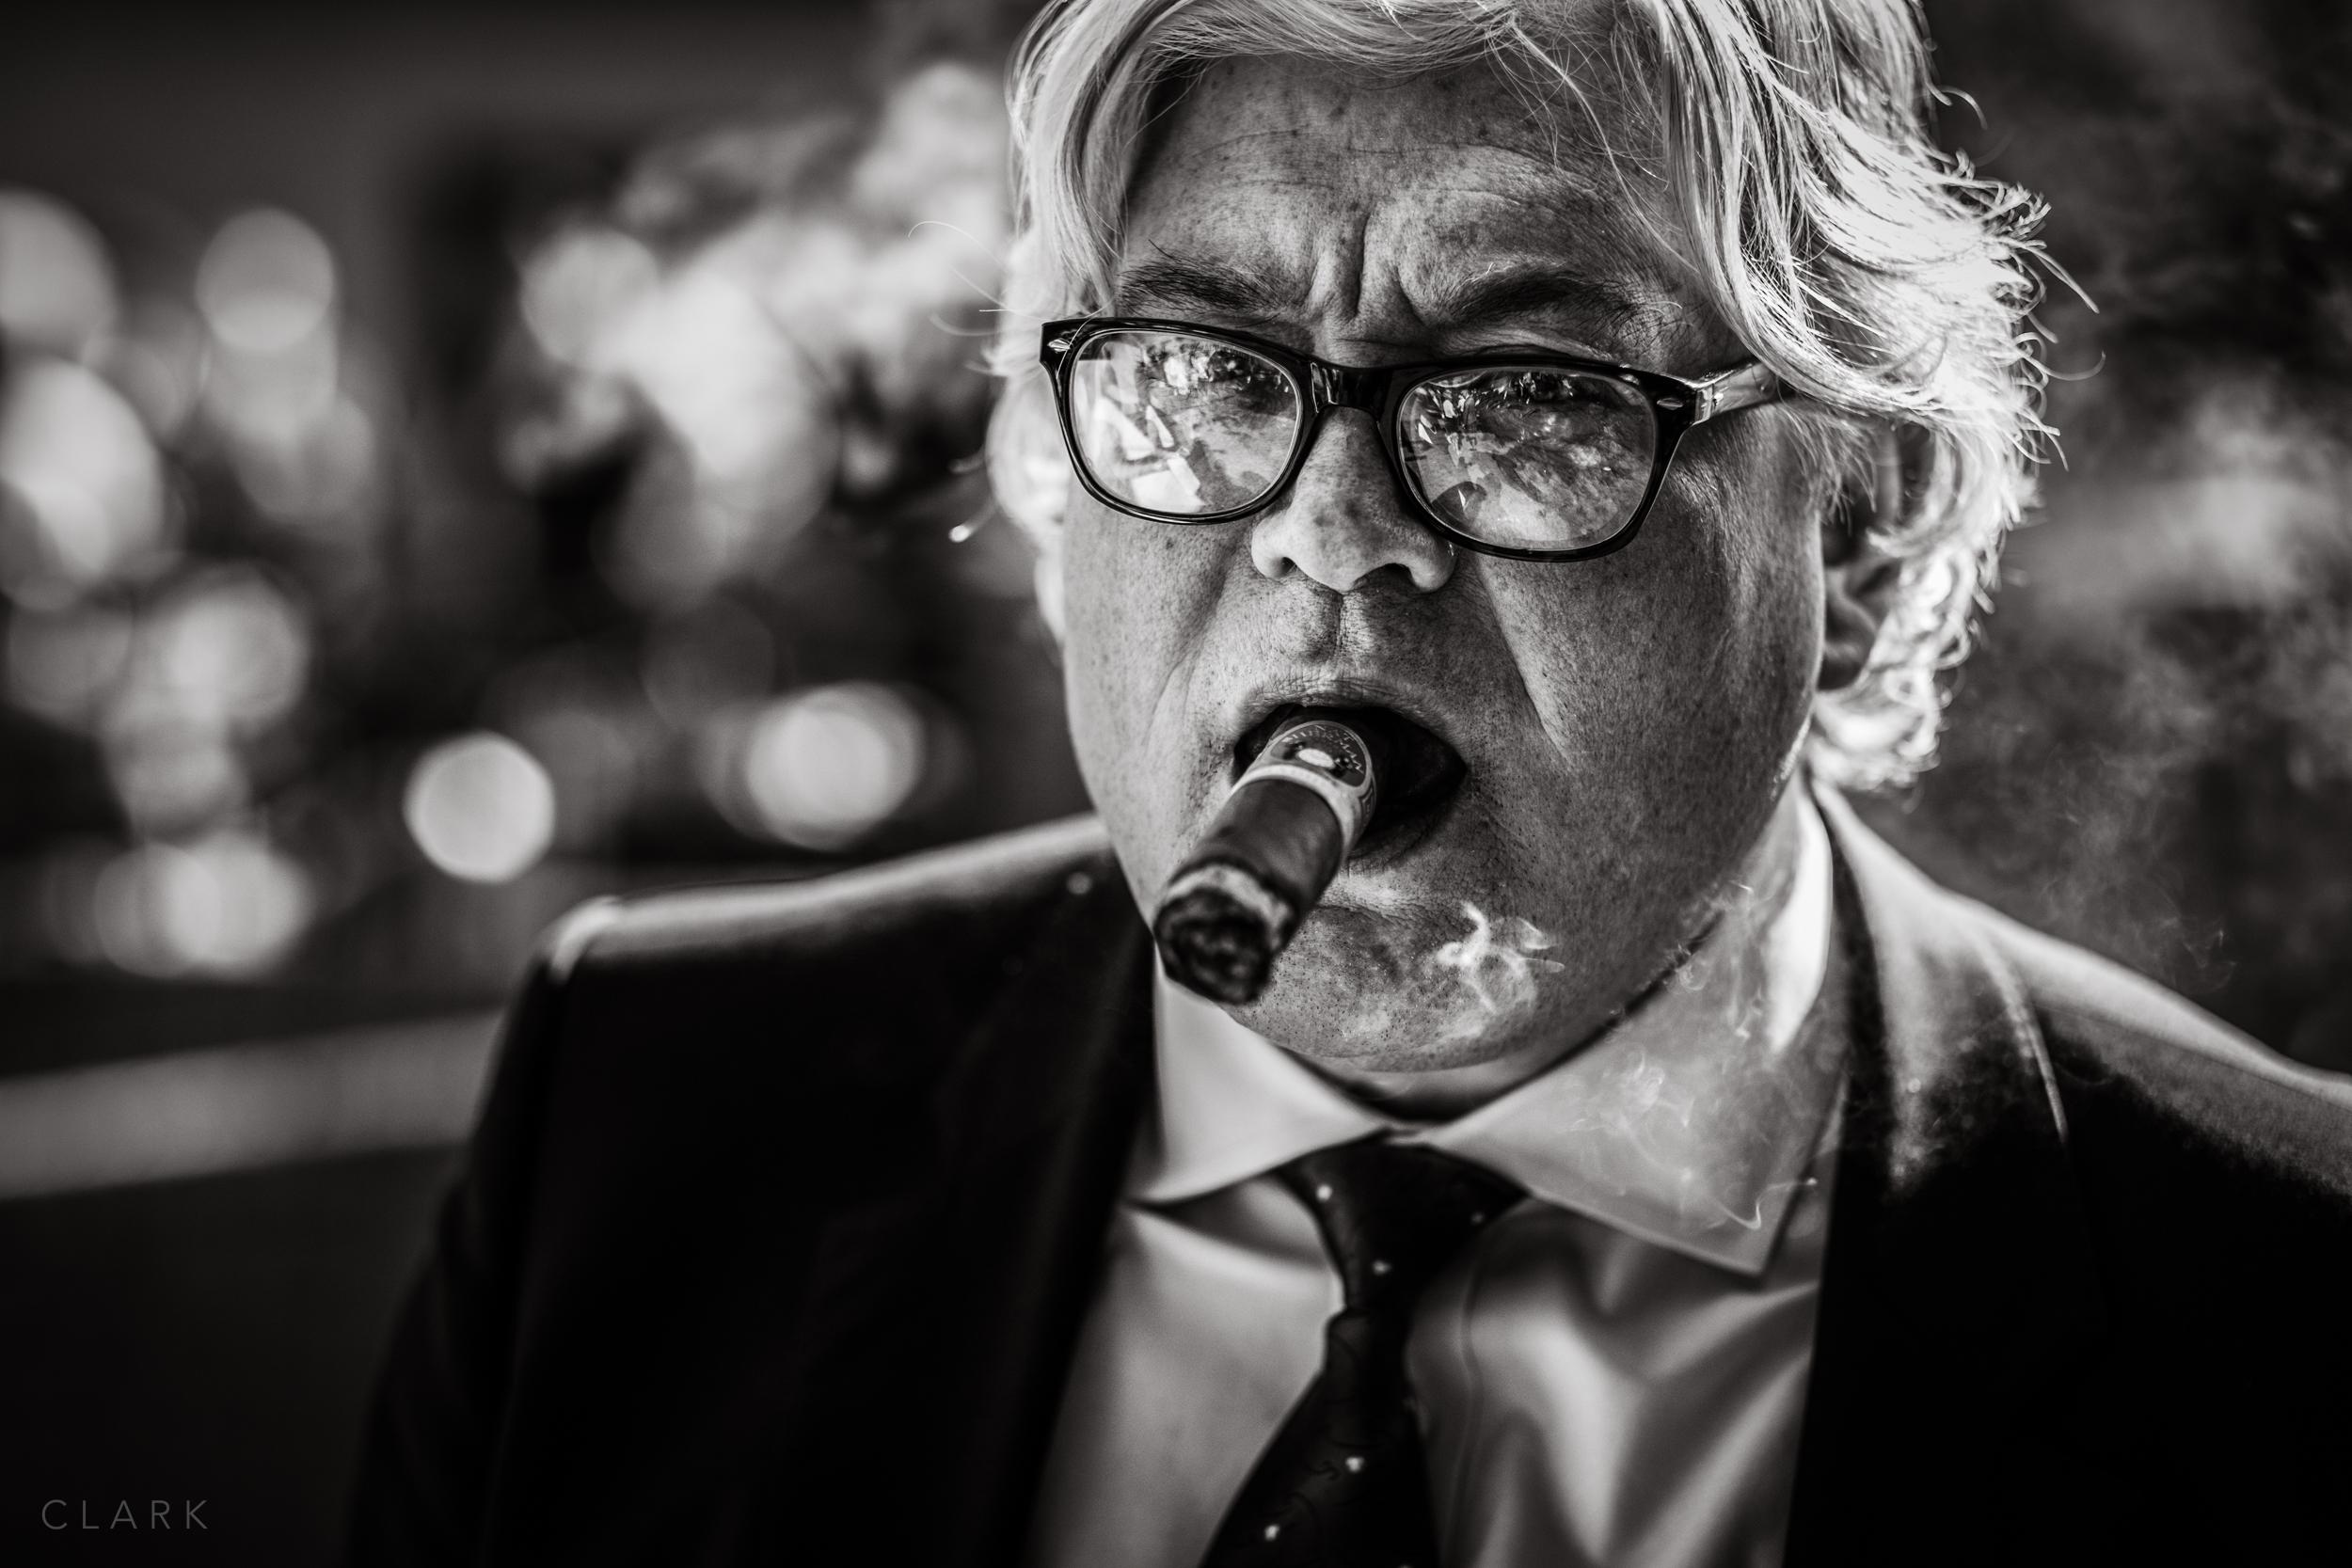 001_DerekClarkPhoto-Cigar.jpg